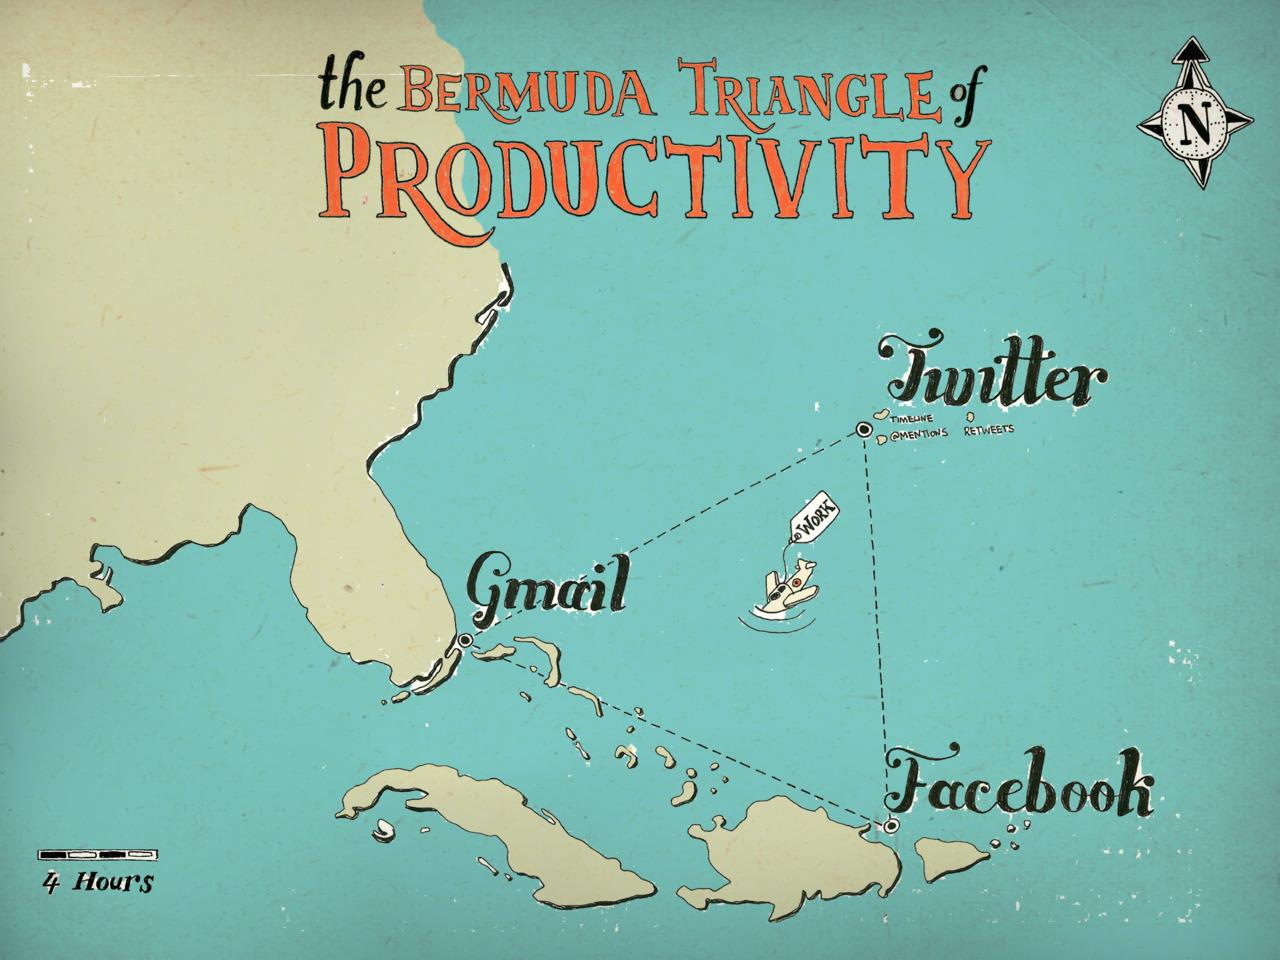 bermuda-triangle-